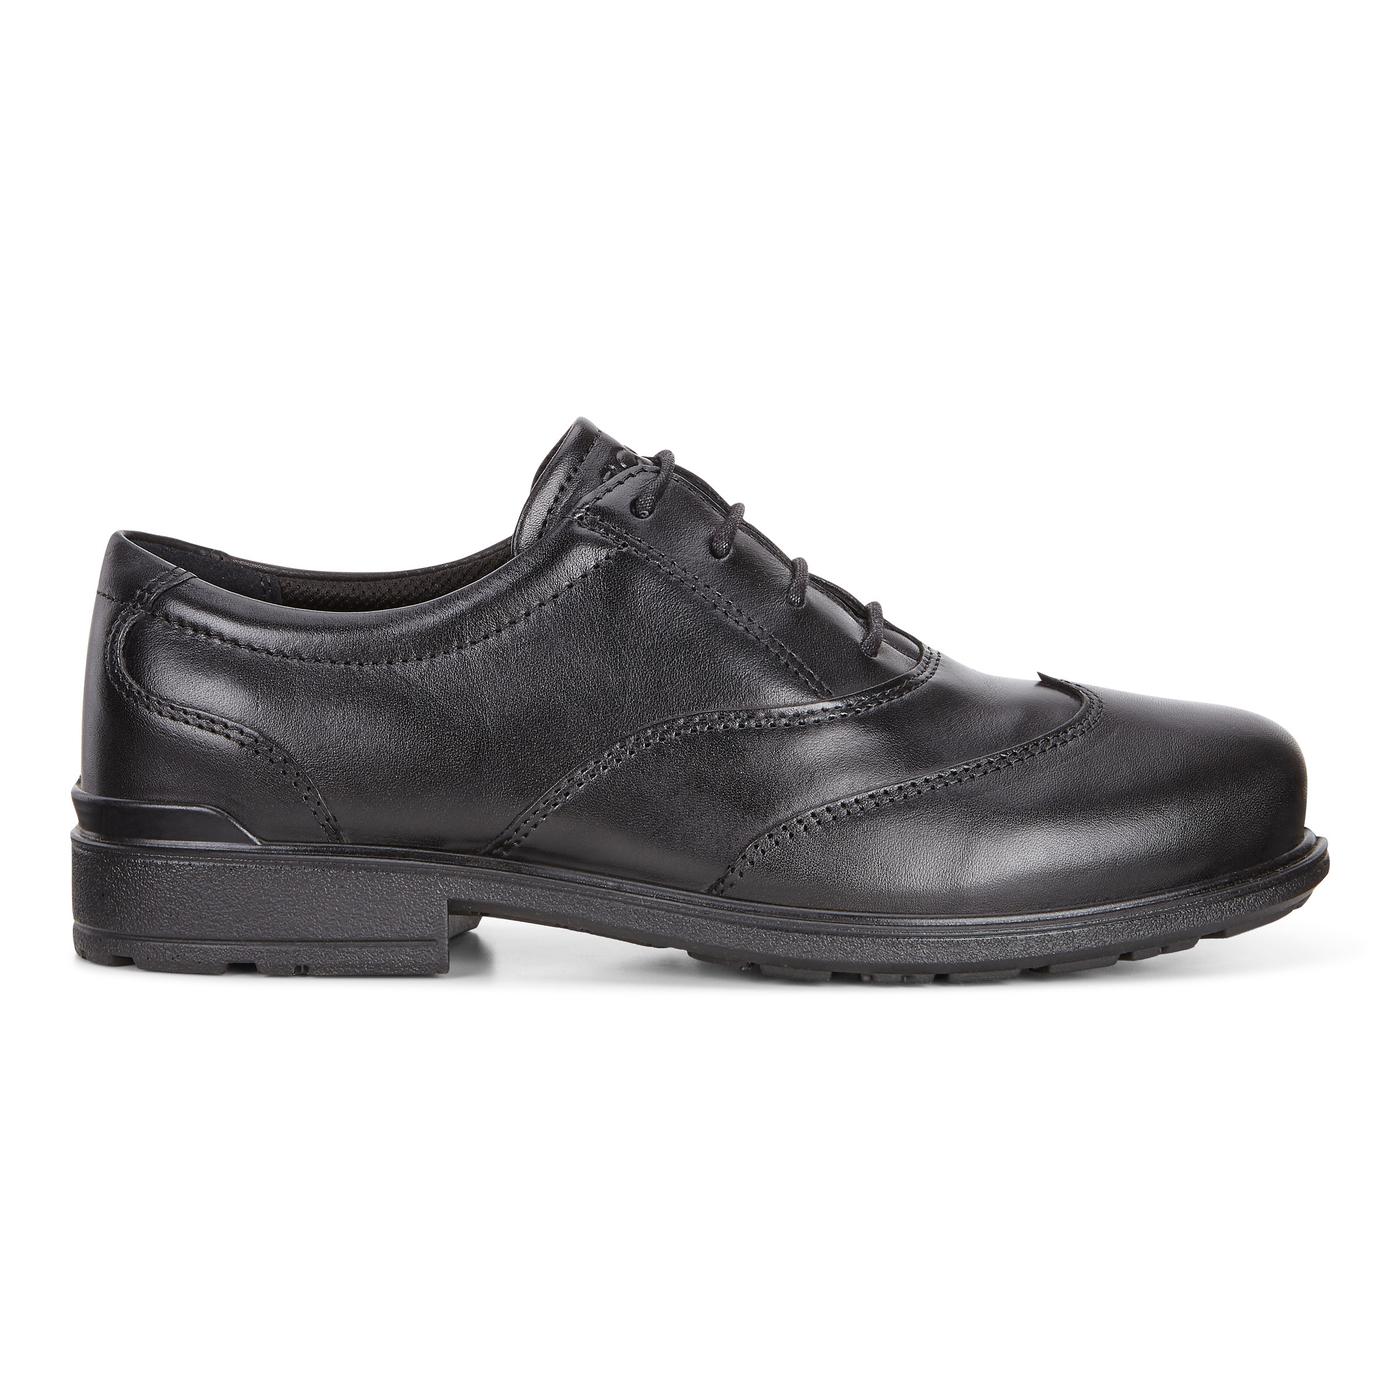 ECCO COHEN Shoe